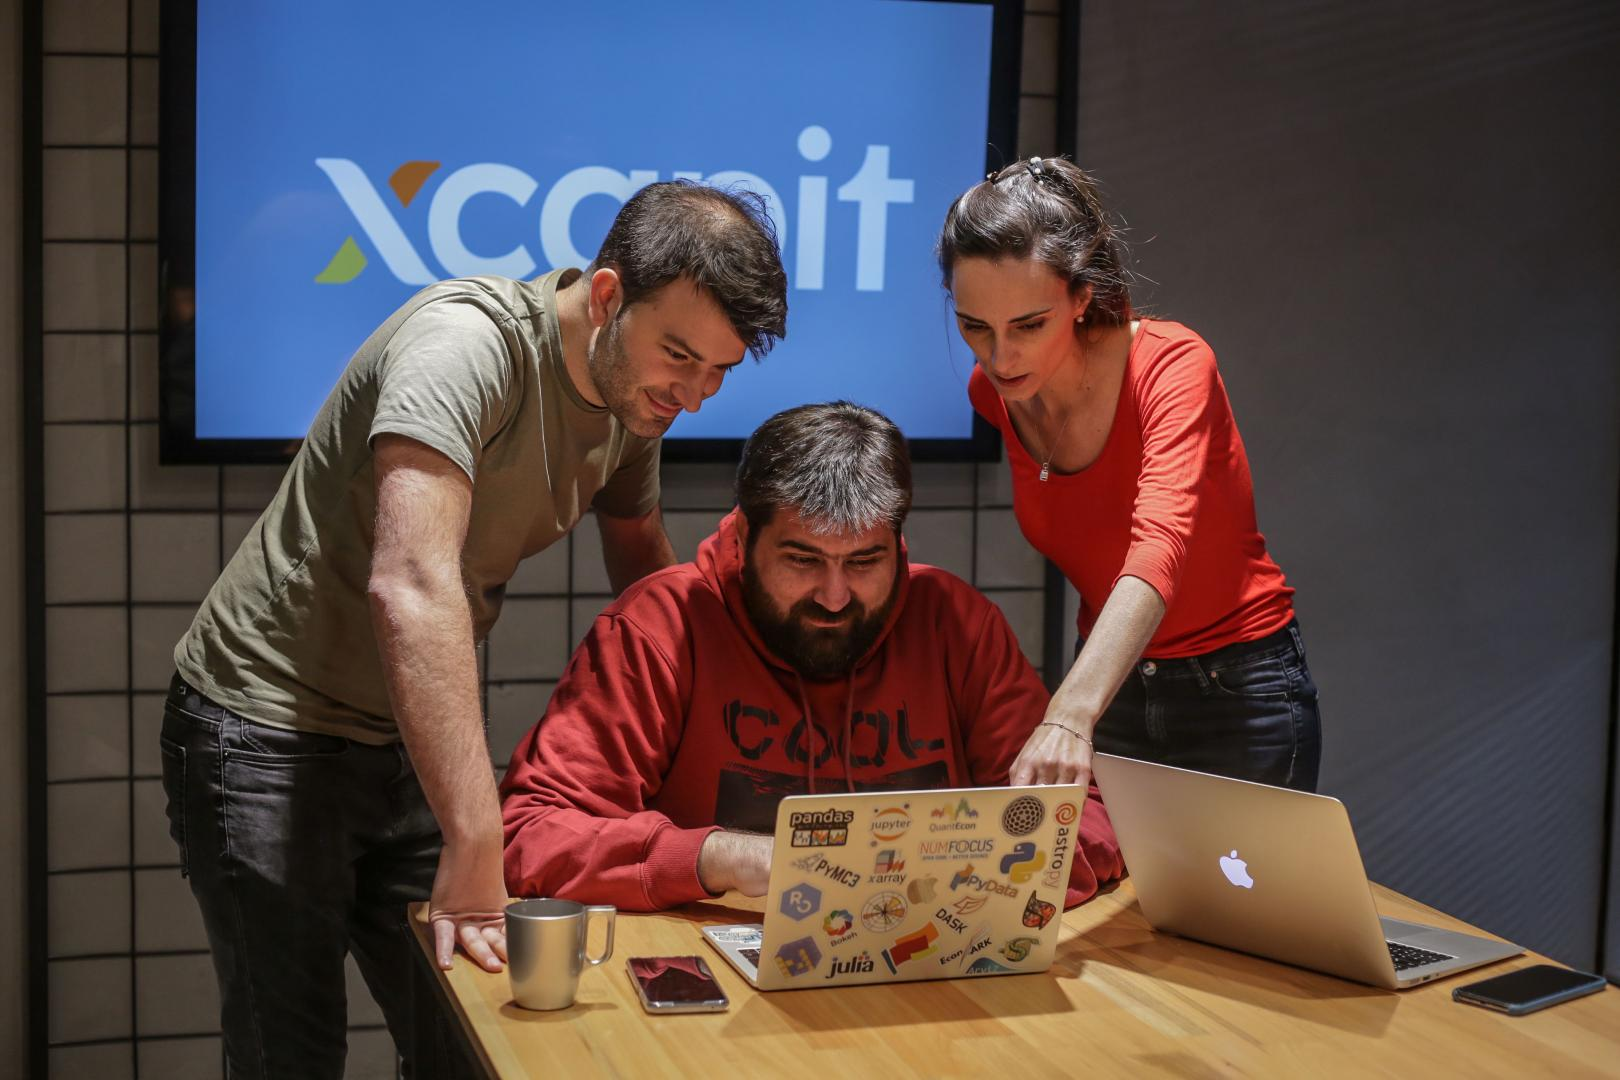 Xcapit celebra su llegada a México regalando 16.921 NFTs en colaboración con Gustavo Abascal